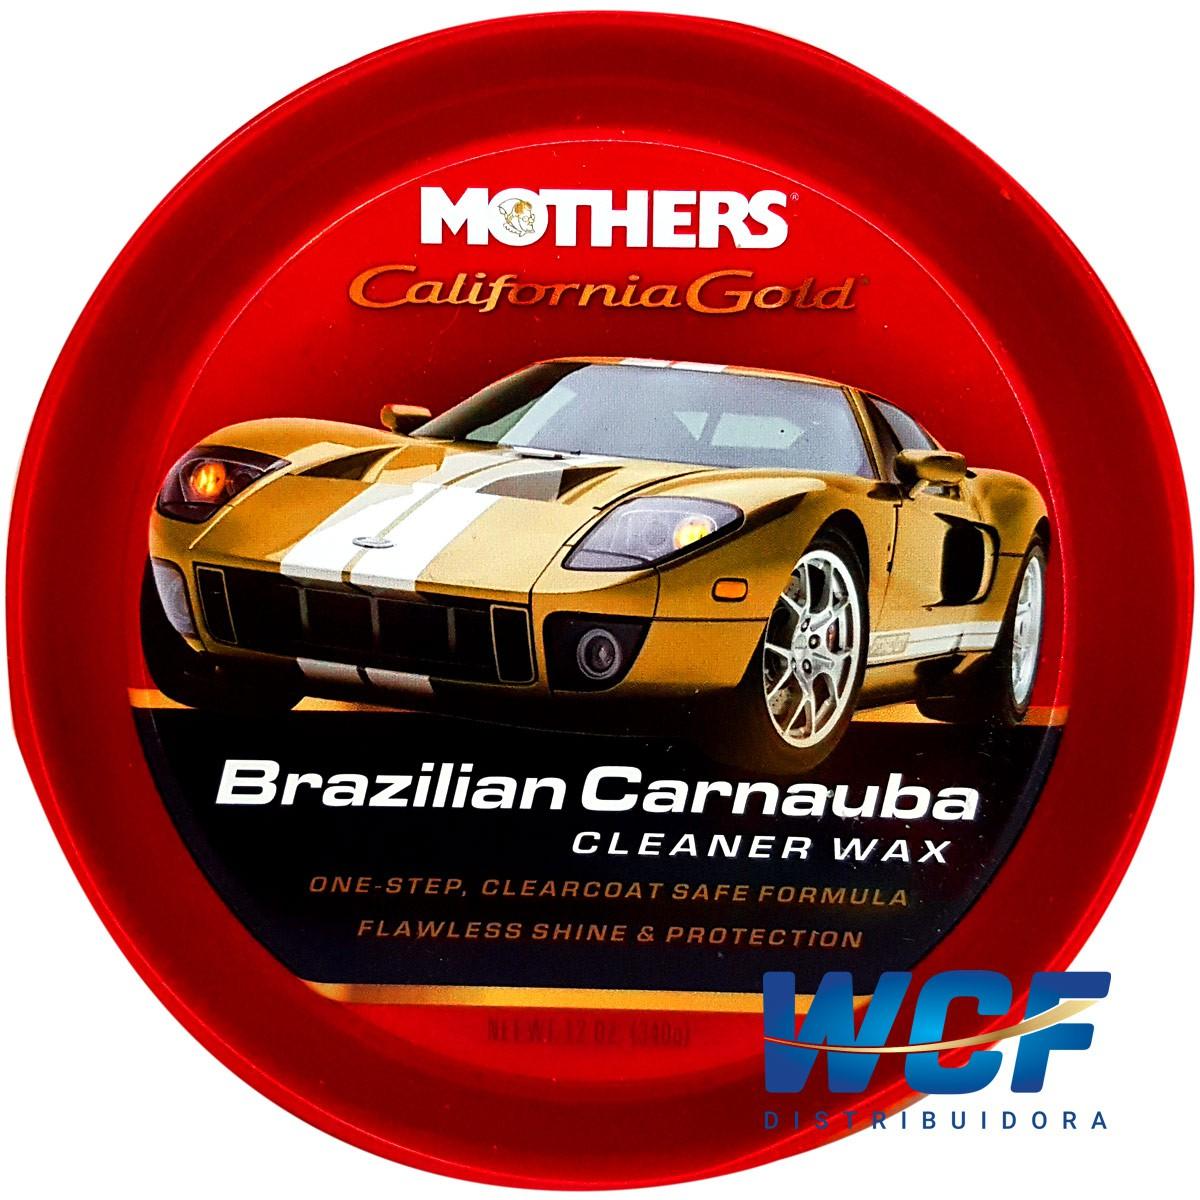 MOTHERS CERA DE CARNAUBA CLEANER WAX PASTA 340G